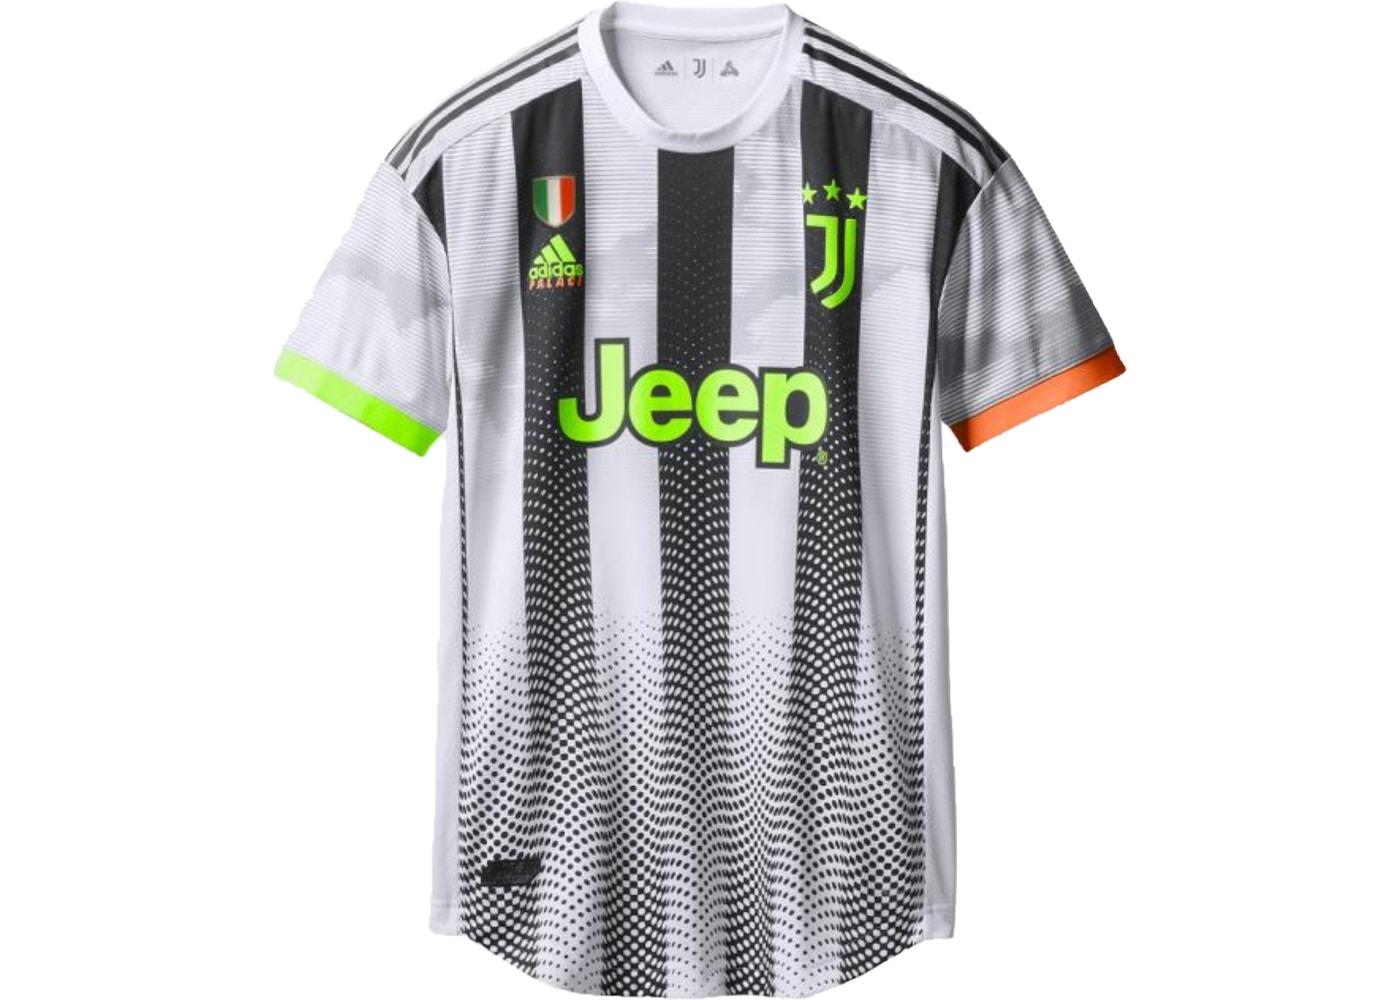 Palace Adidas Palace Juventus Authentic Ronaldo 7 Match Jersey White